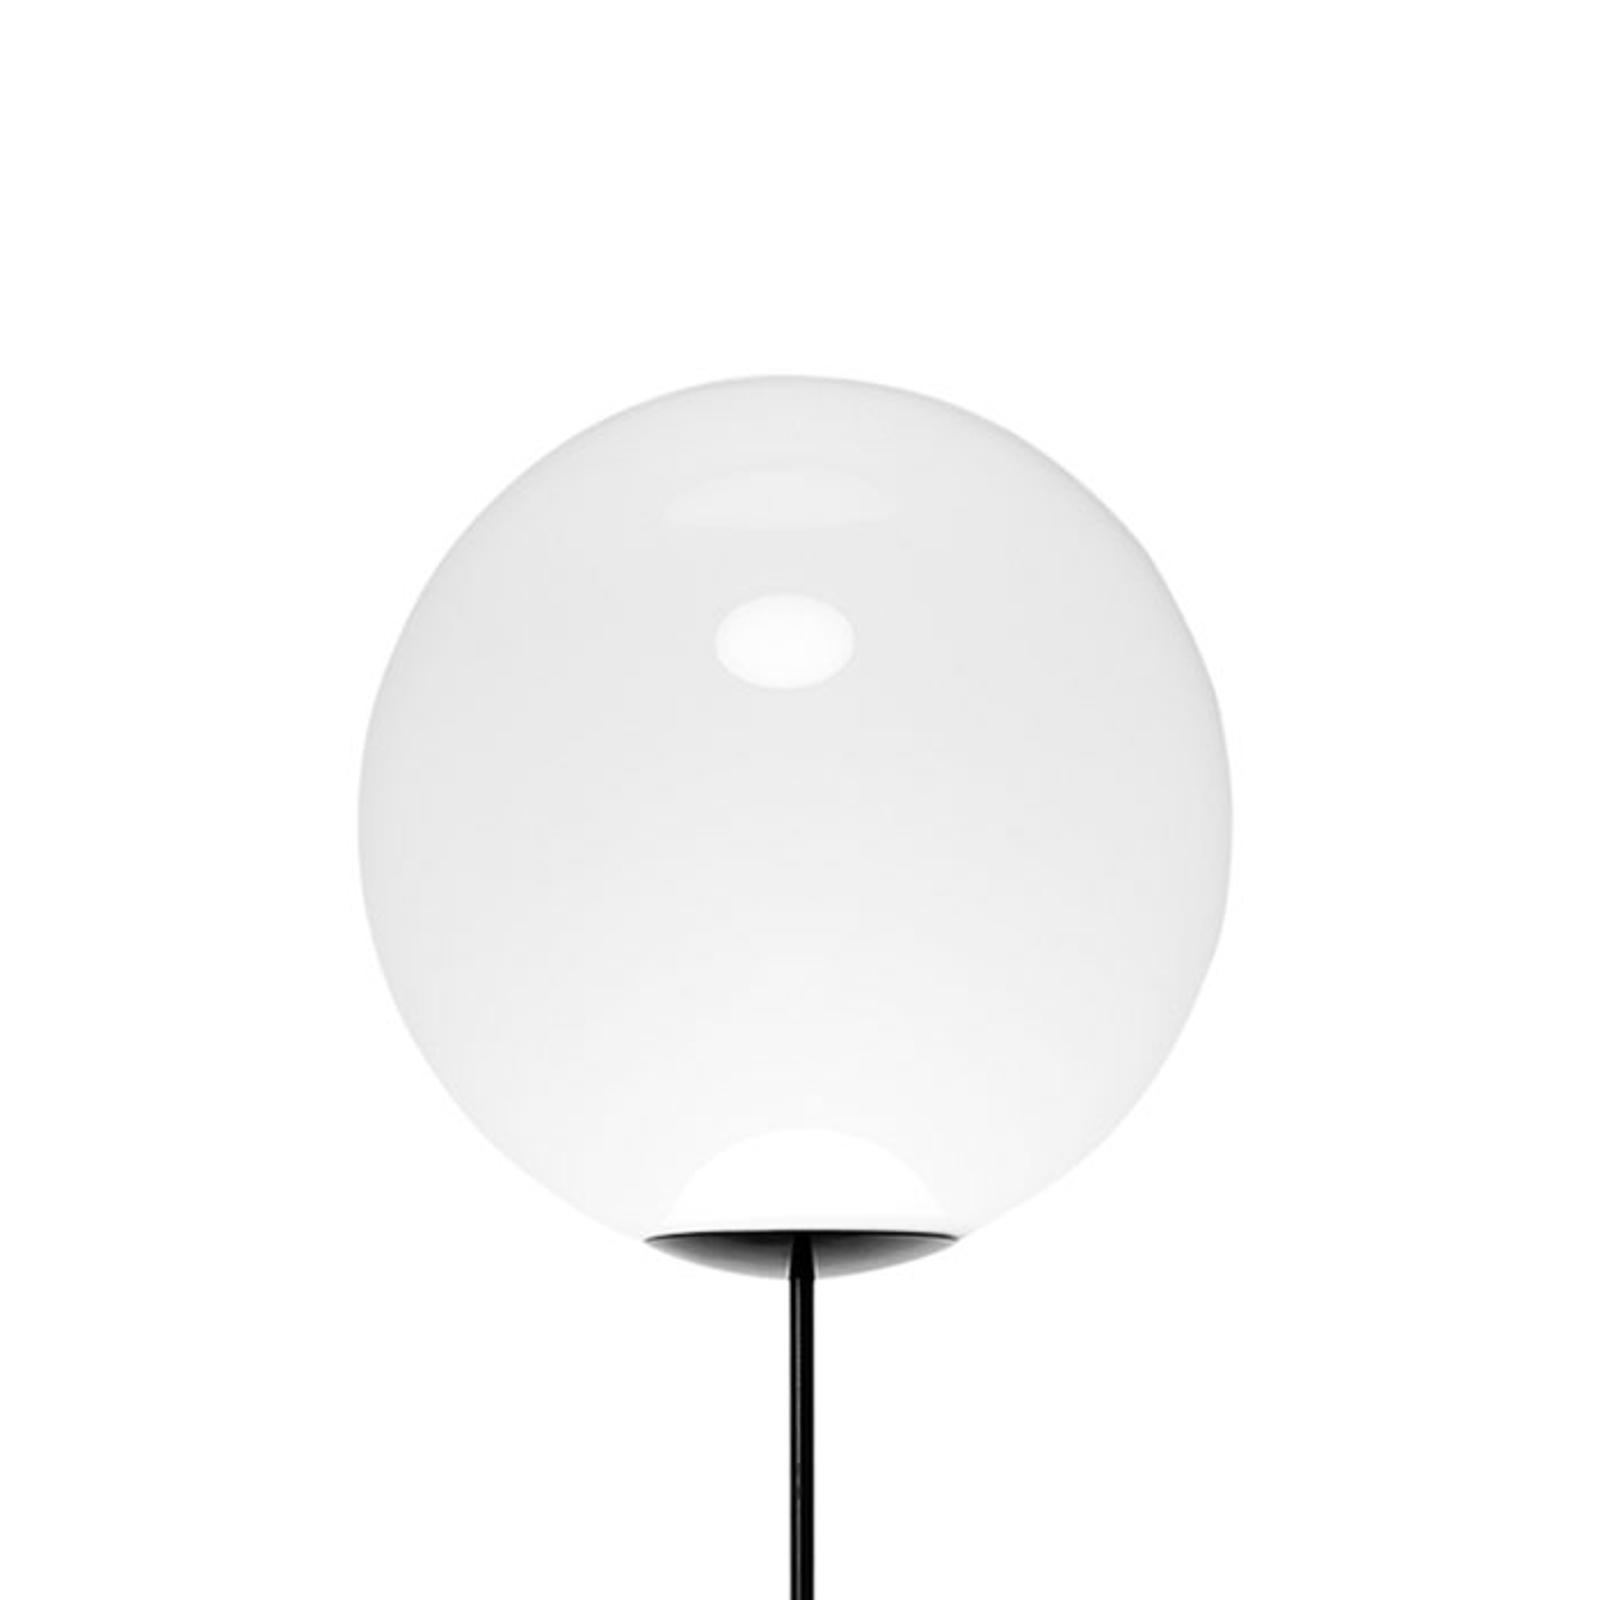 Tom Dixon Opal Cone LED-Stehlampe Ø50cm